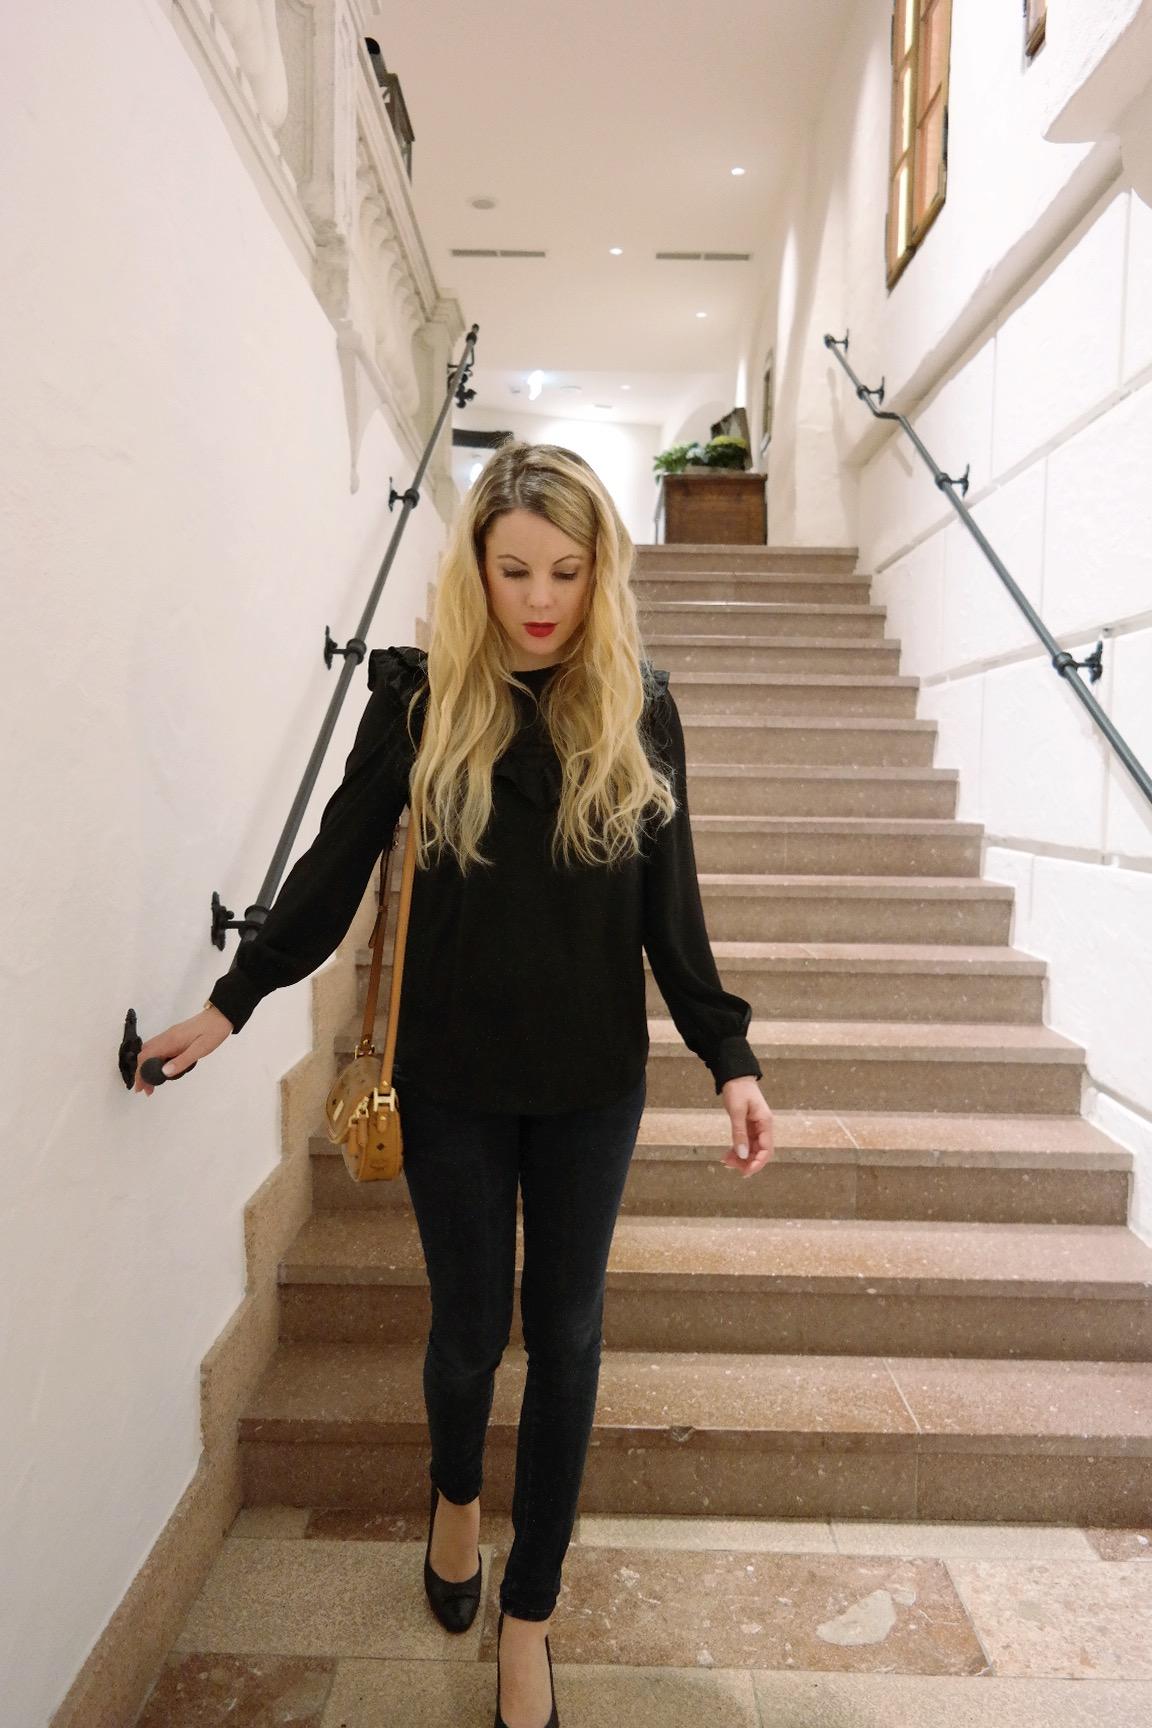 posthotel achenkirch missbbontour bonn reiseblog reiseblogger erfahrung tirol urlaub kurzreise wellness (37)